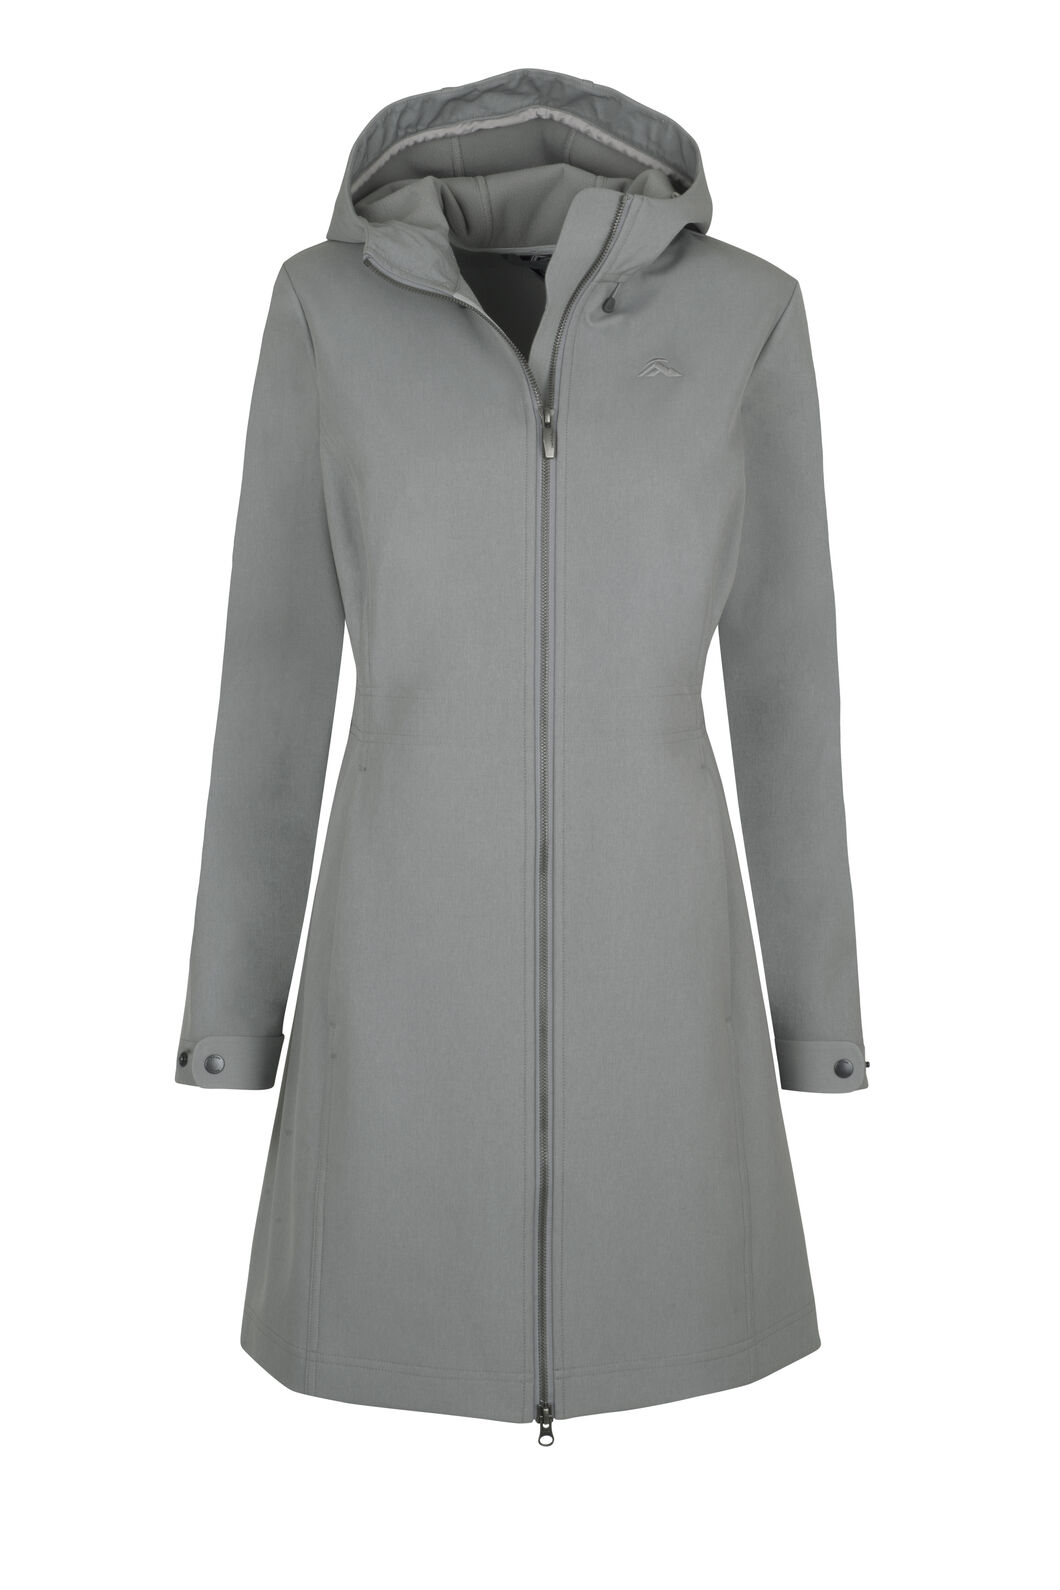 Macpac Chord Softshell Hooded Coat — Women's, Monument, hi-res